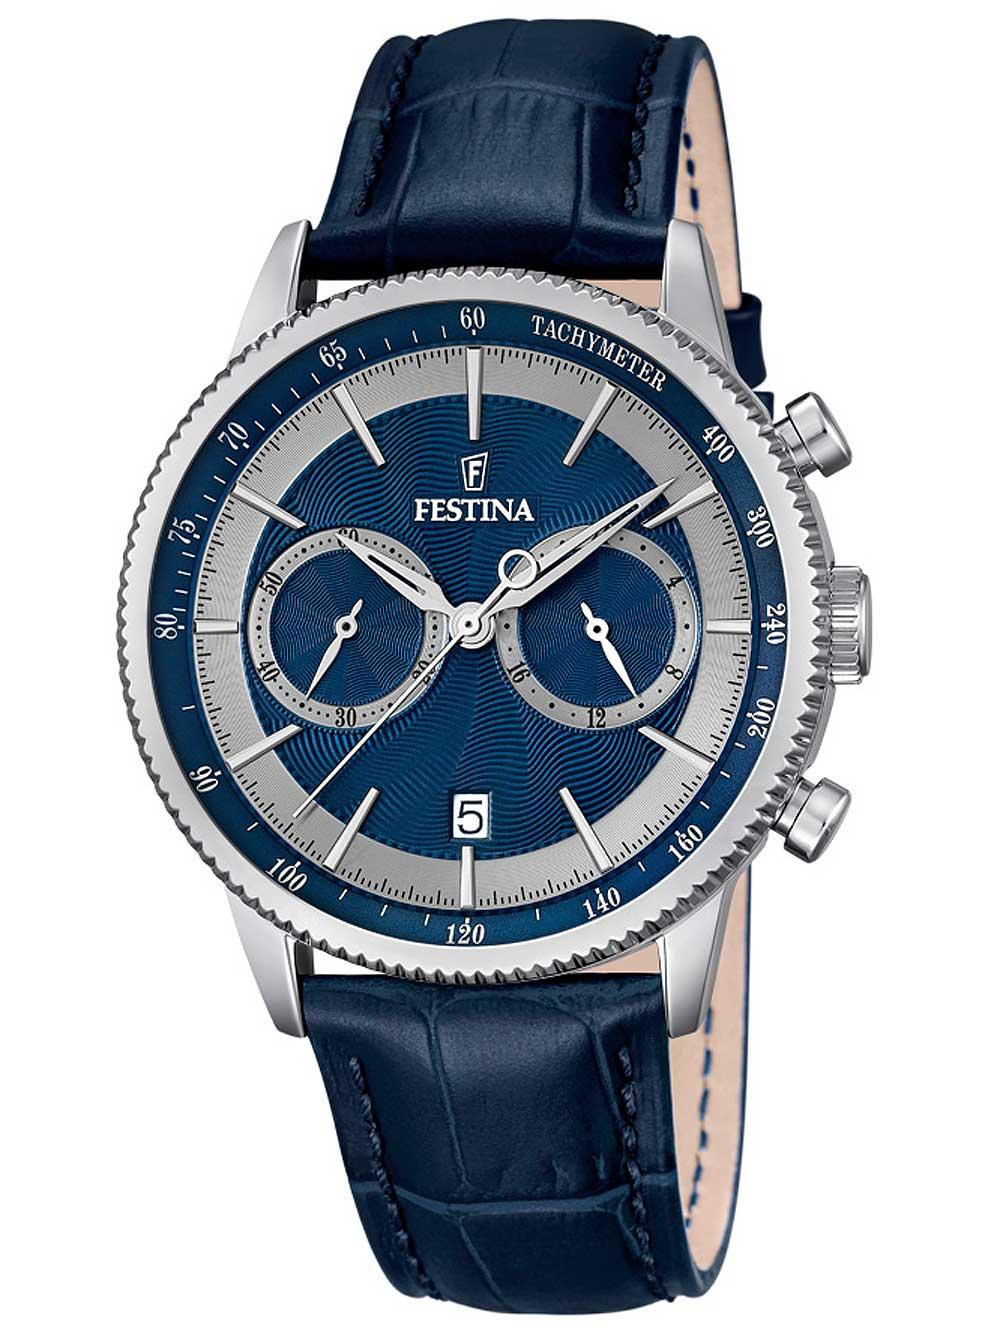 Festina F16893 6 Chronograph Herren 41mm 5ATM